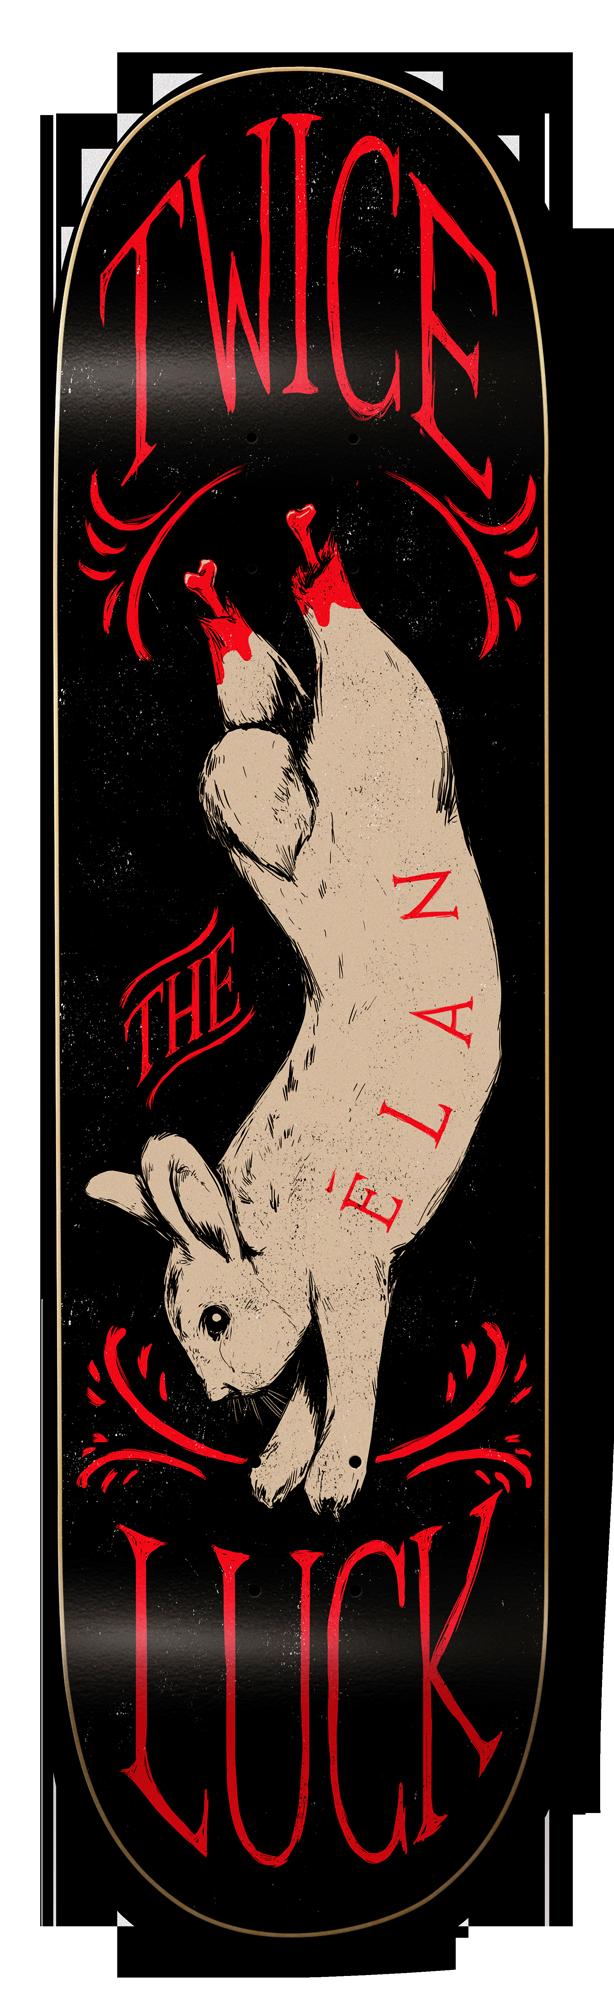 Élan, Twice The Luck - Animal Series